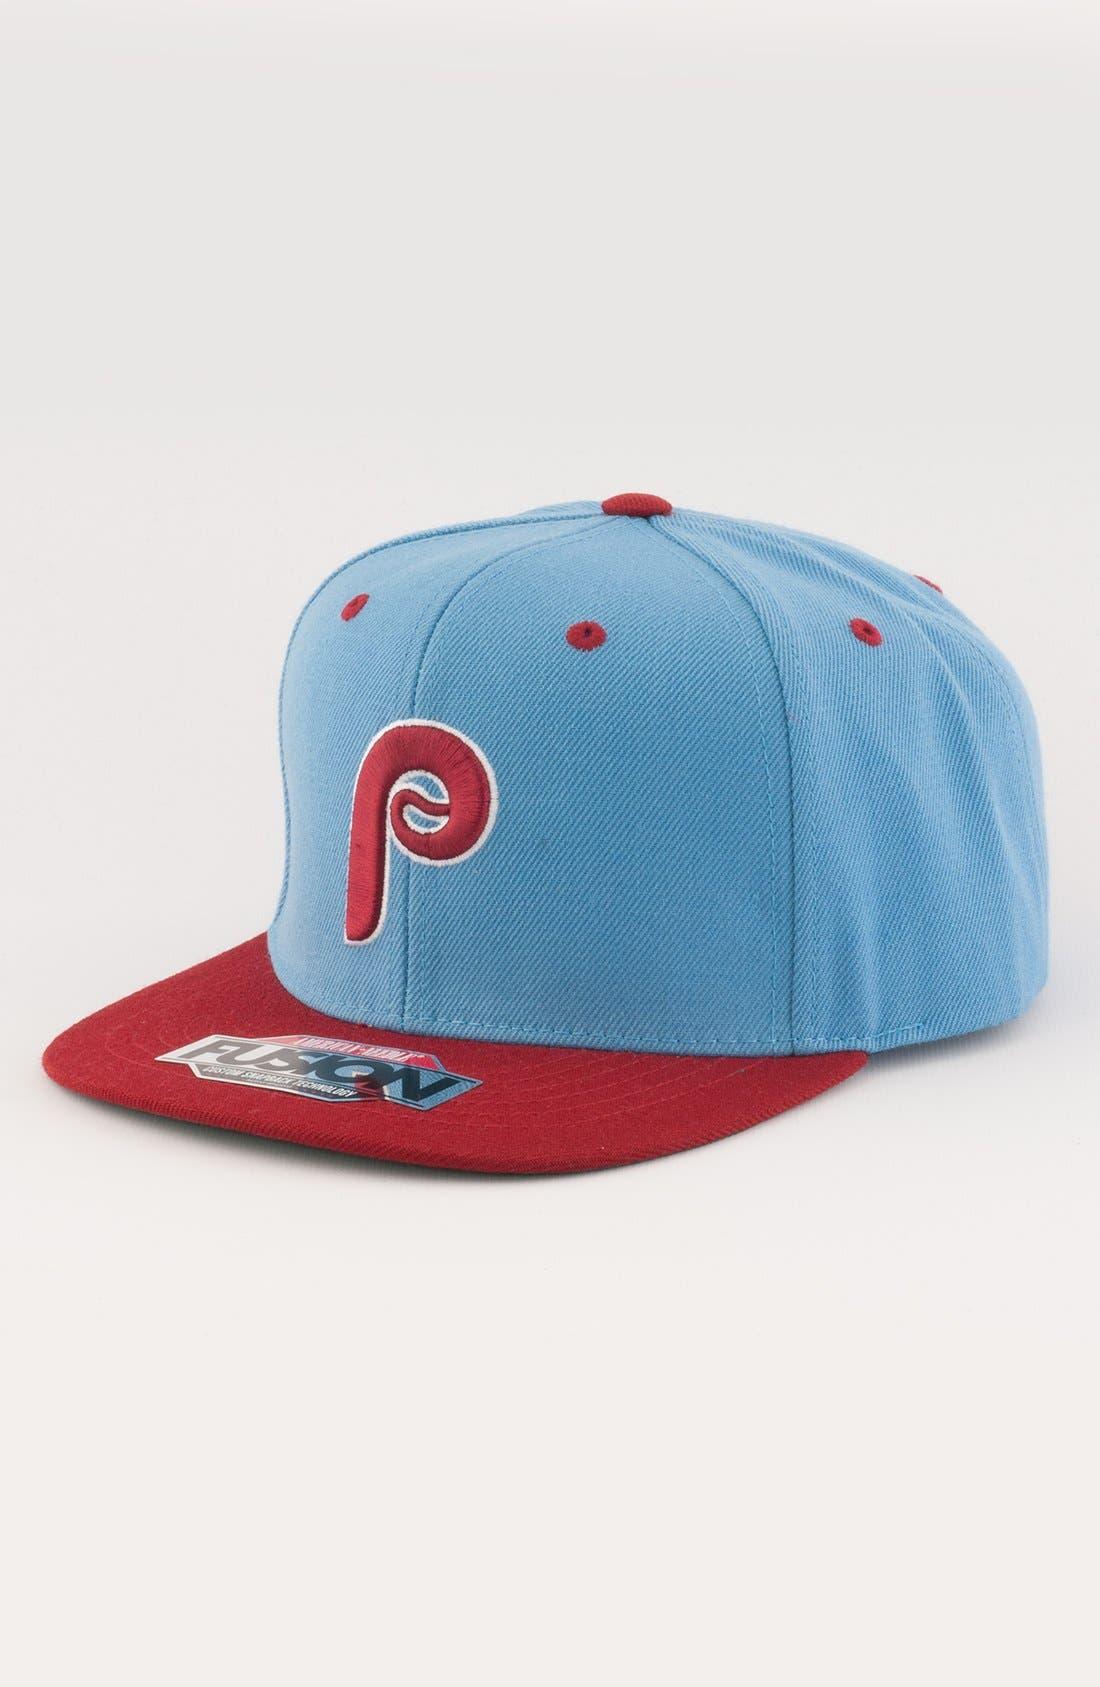 Alternate Image 1 Selected - American Needle 'Philadelphia Phillies - Back 2 Front' Snapback Baseball Cap